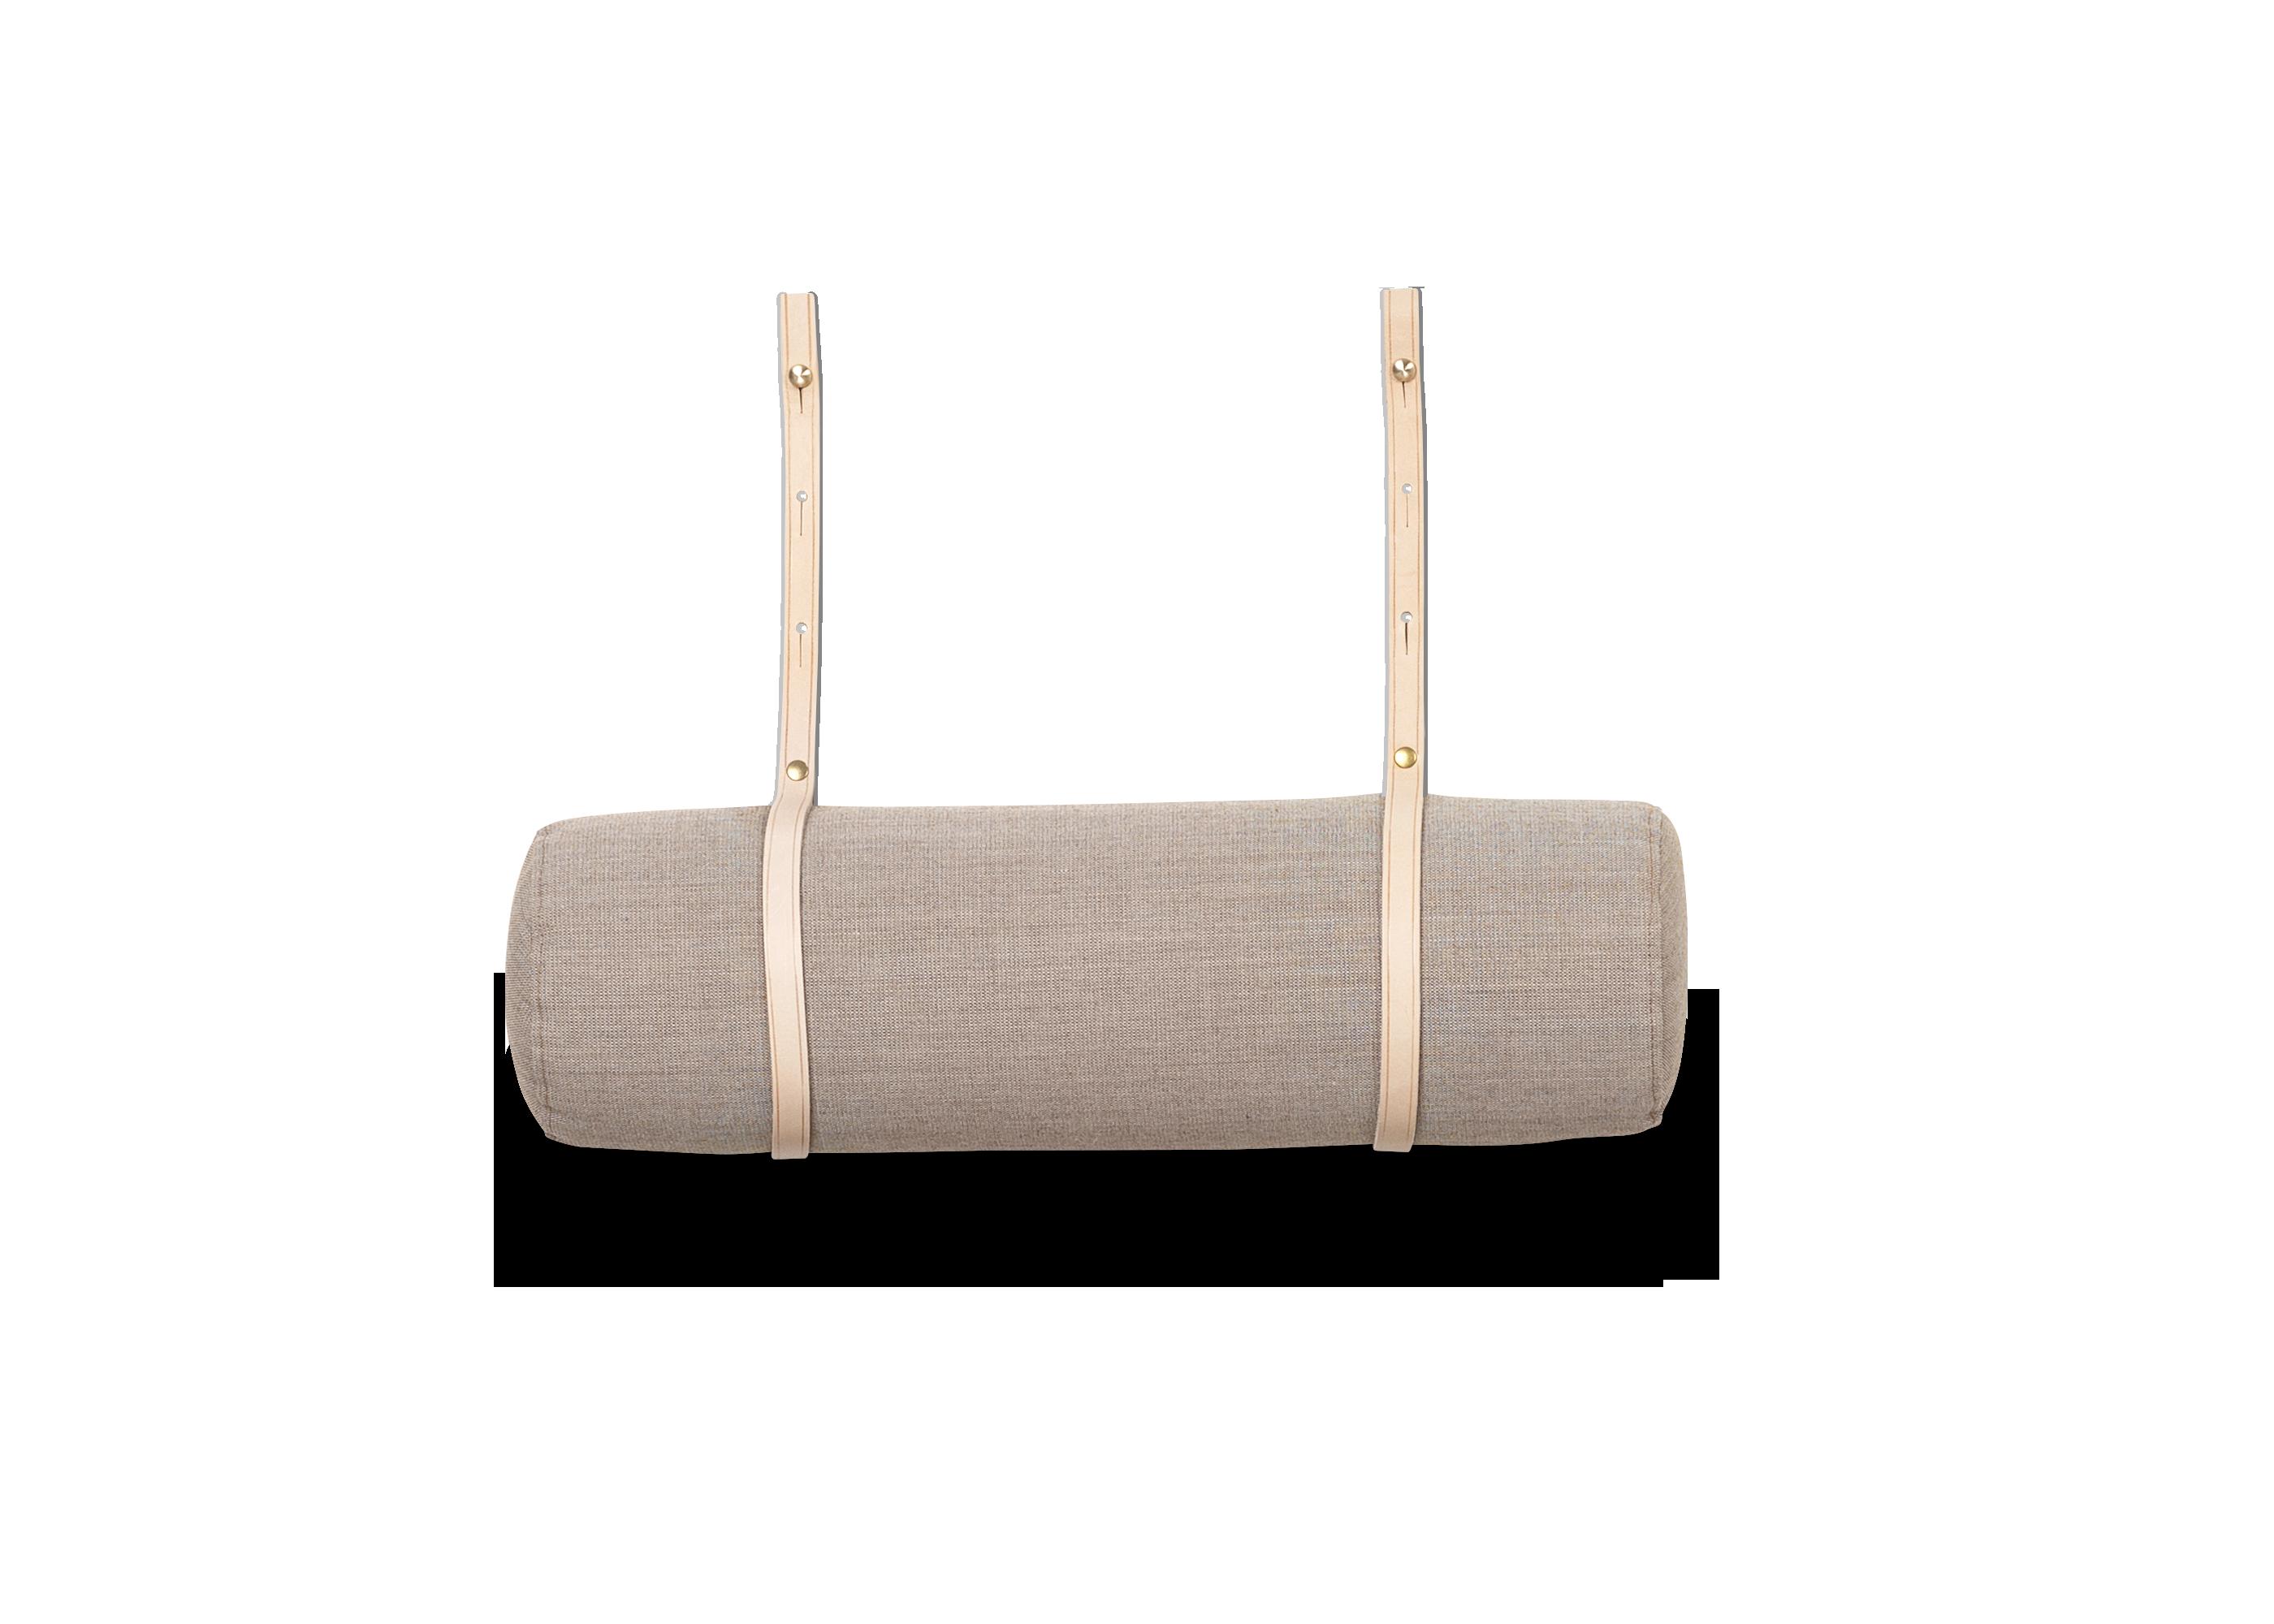 CU BM0865 | Round cushion